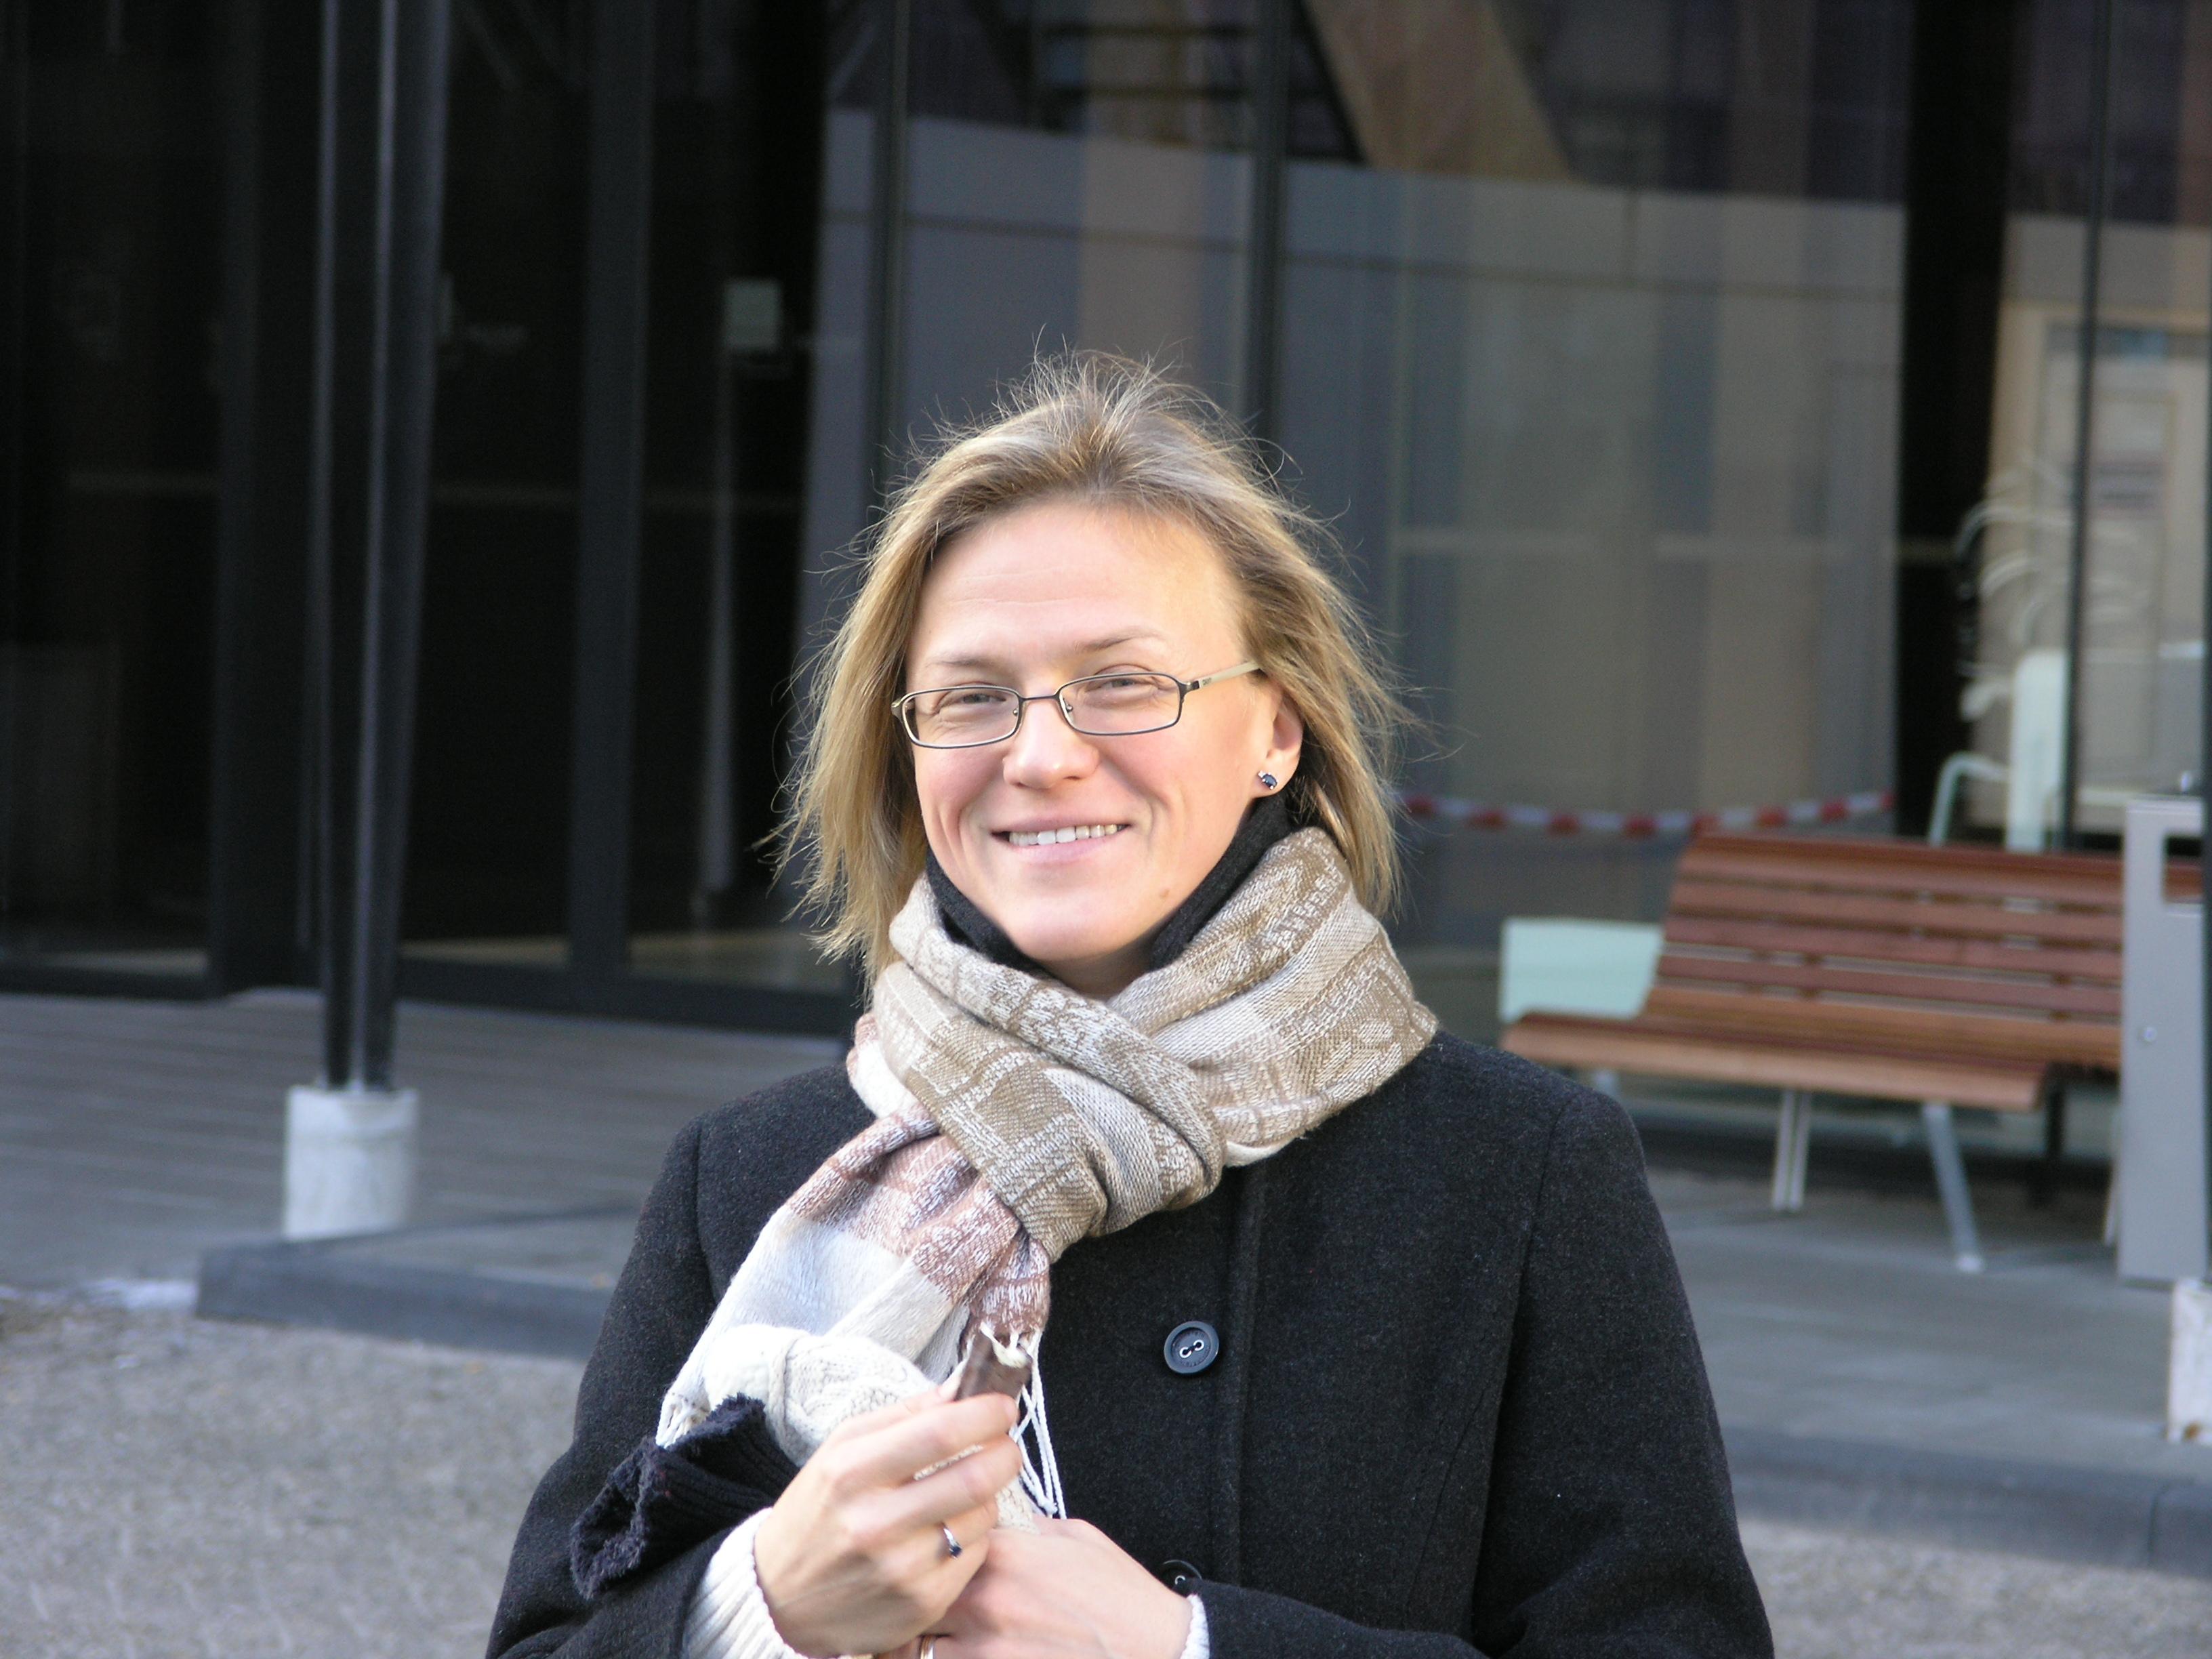 Gabriela Wasileski